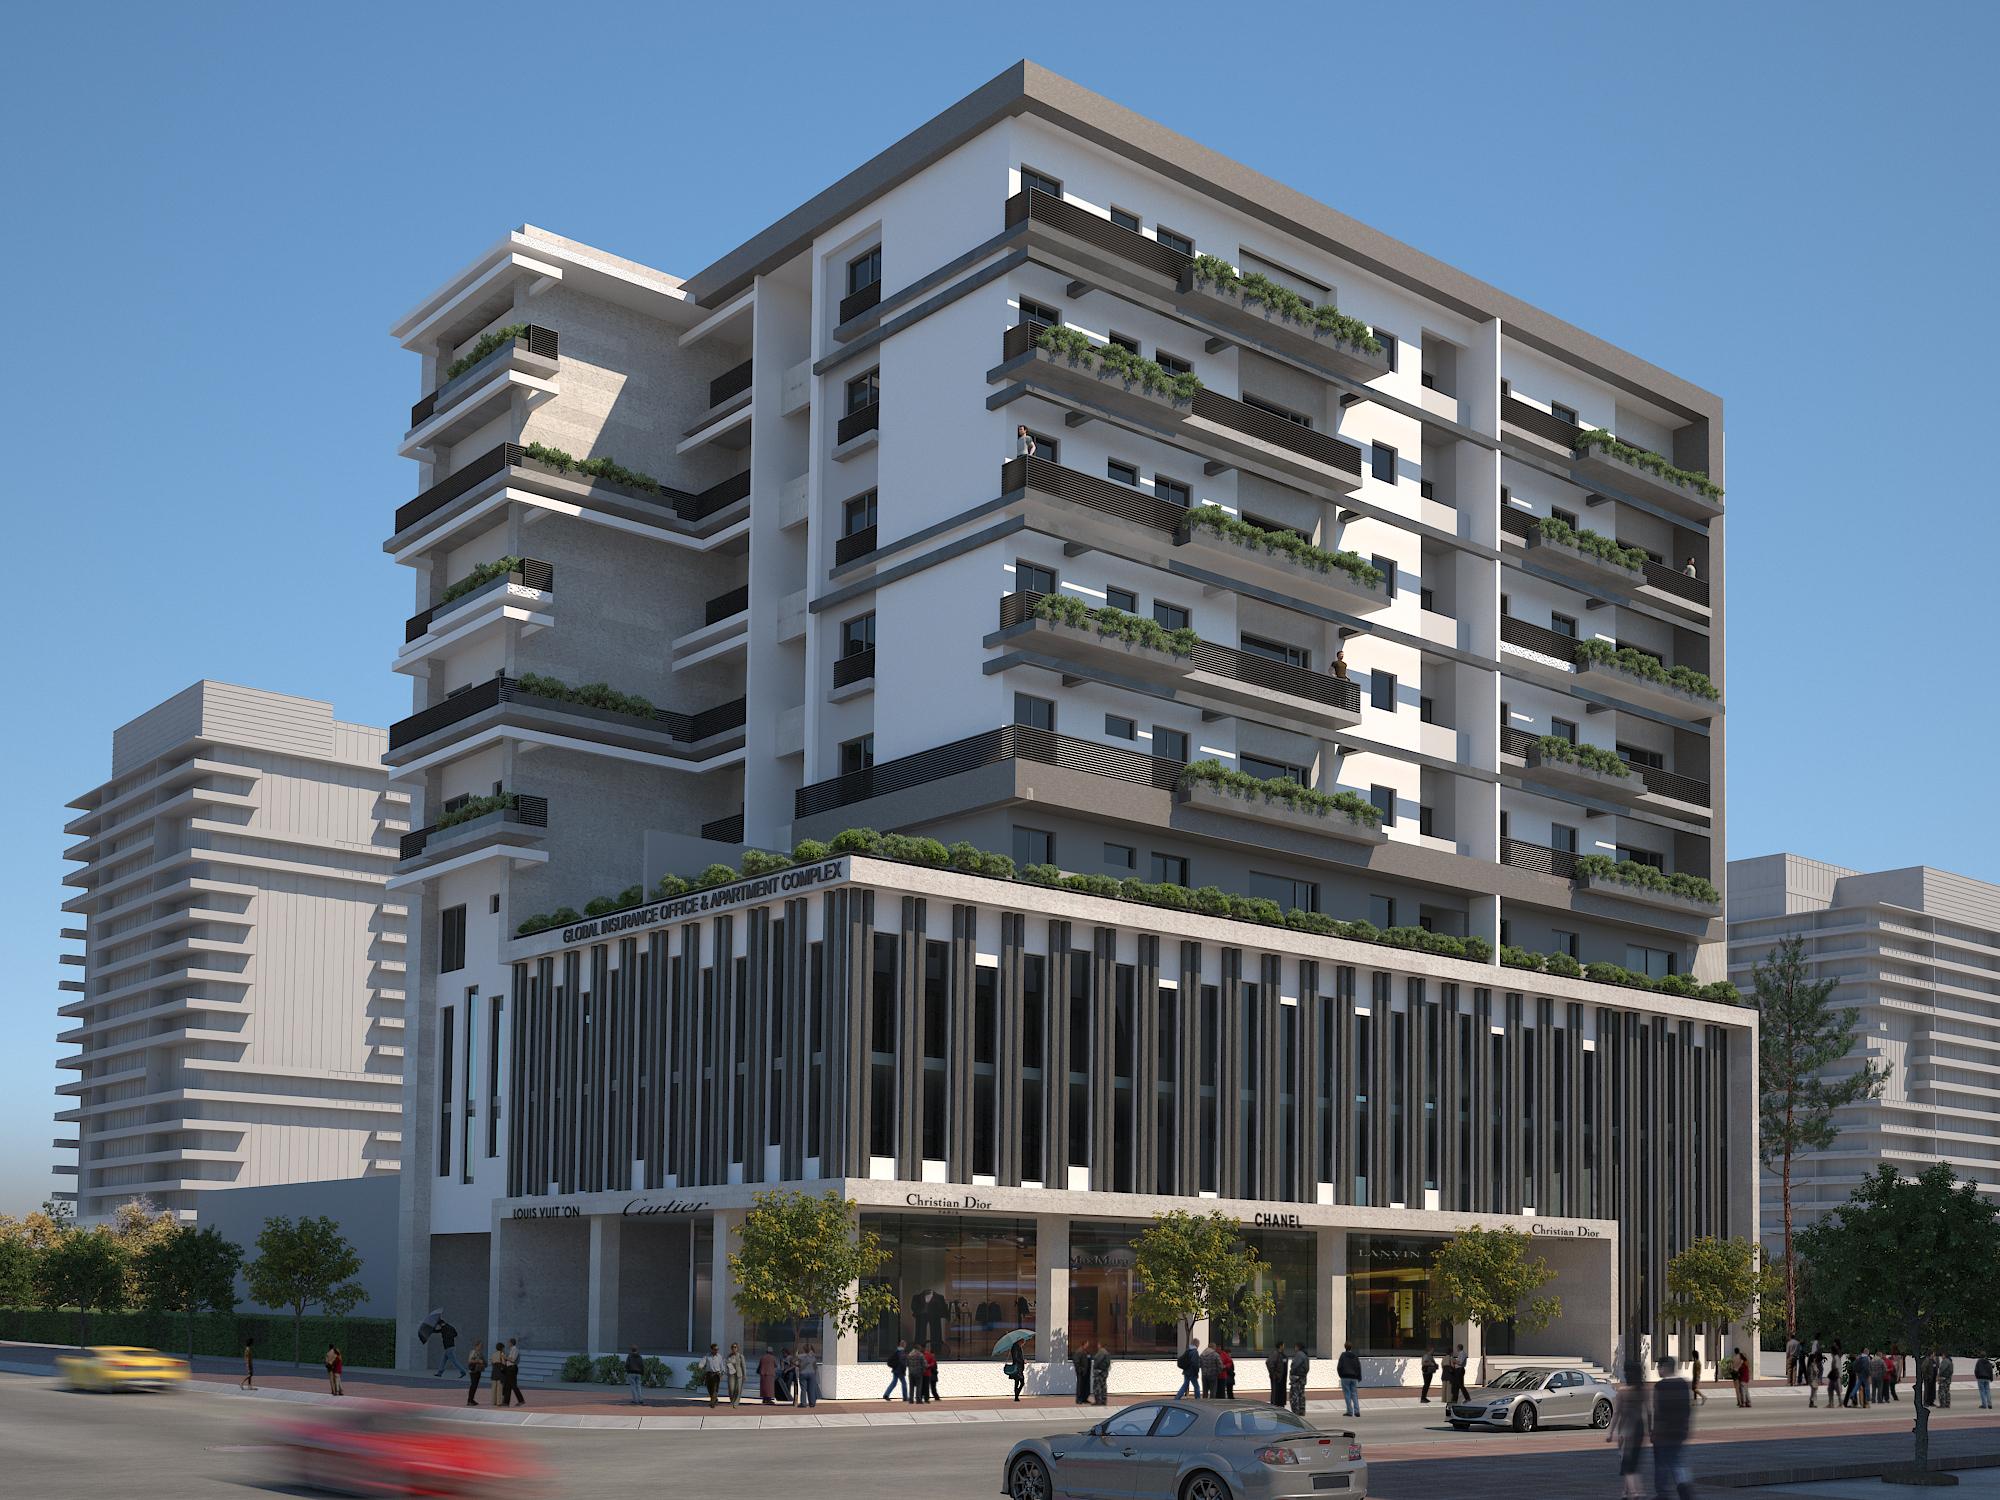 Global 1 - Global Insurance Apartment Complex